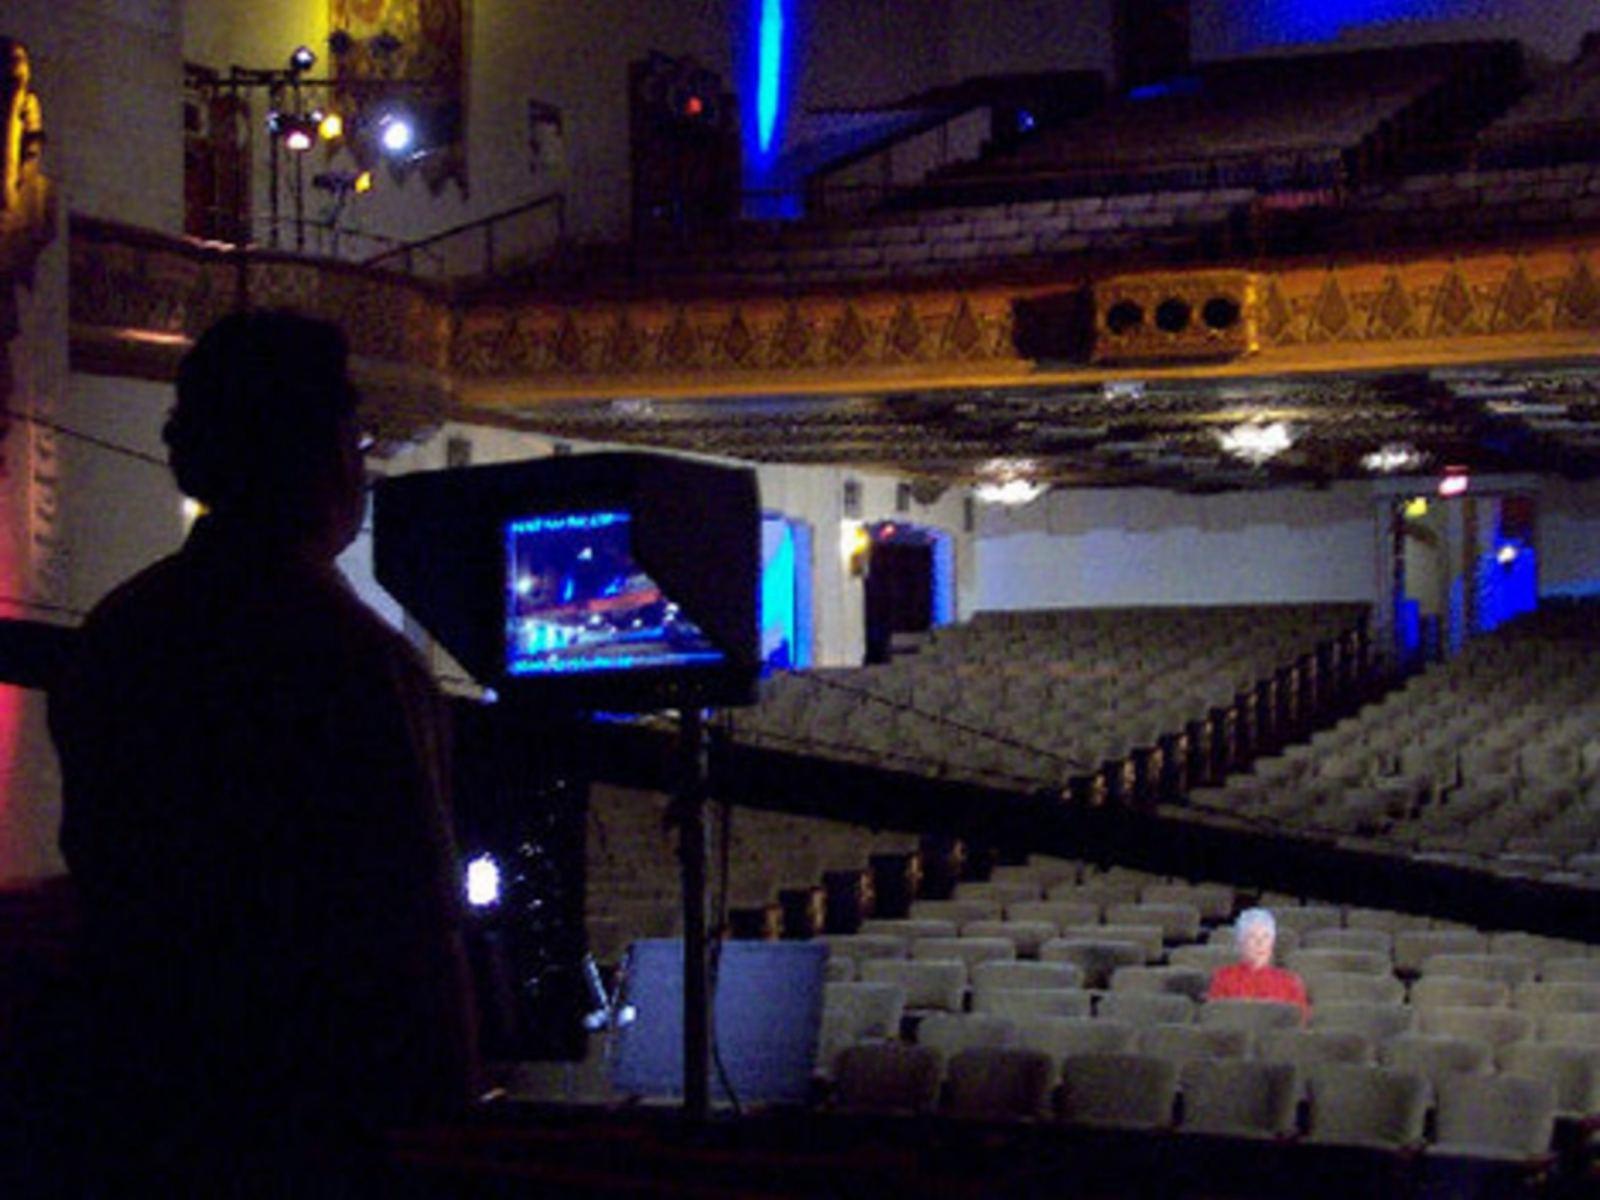 Warner Grand Theatre filming